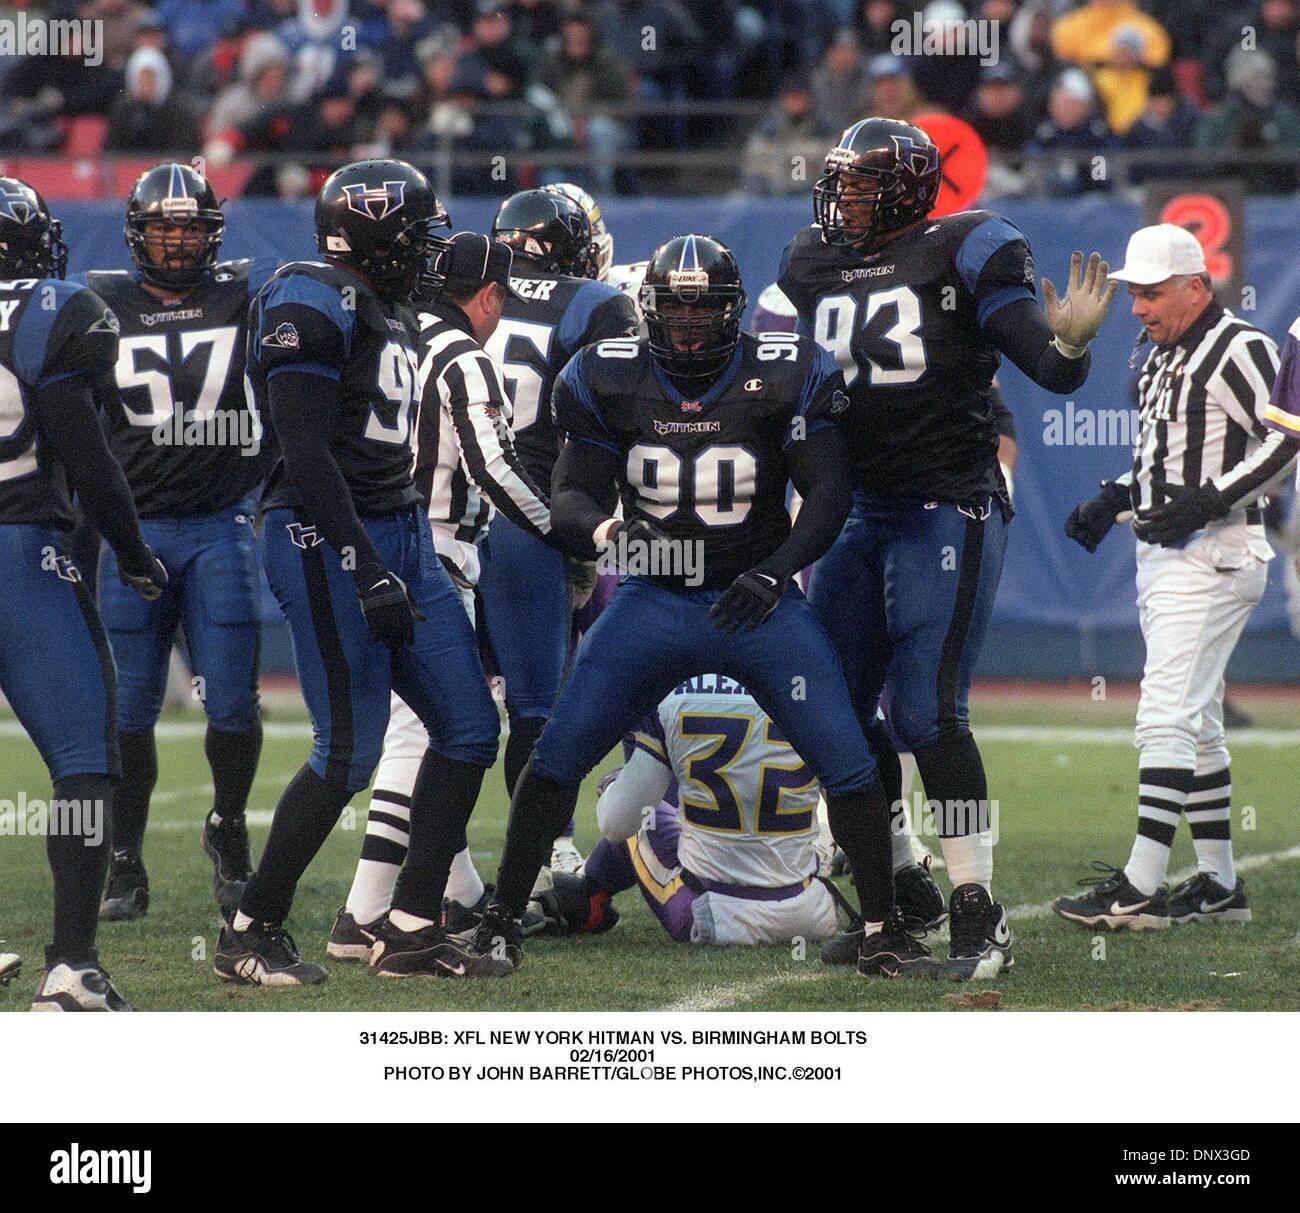 16. Februar 2001 - 31425JBB: XFL NEW YORK HITMAN VS. BIRMINGHAM-BOLTS.02/16/2001. JOHN BARRETT / 2001 (Kredit-Bild: © Globe Photos/ZUMAPRESS.com) Stockfoto